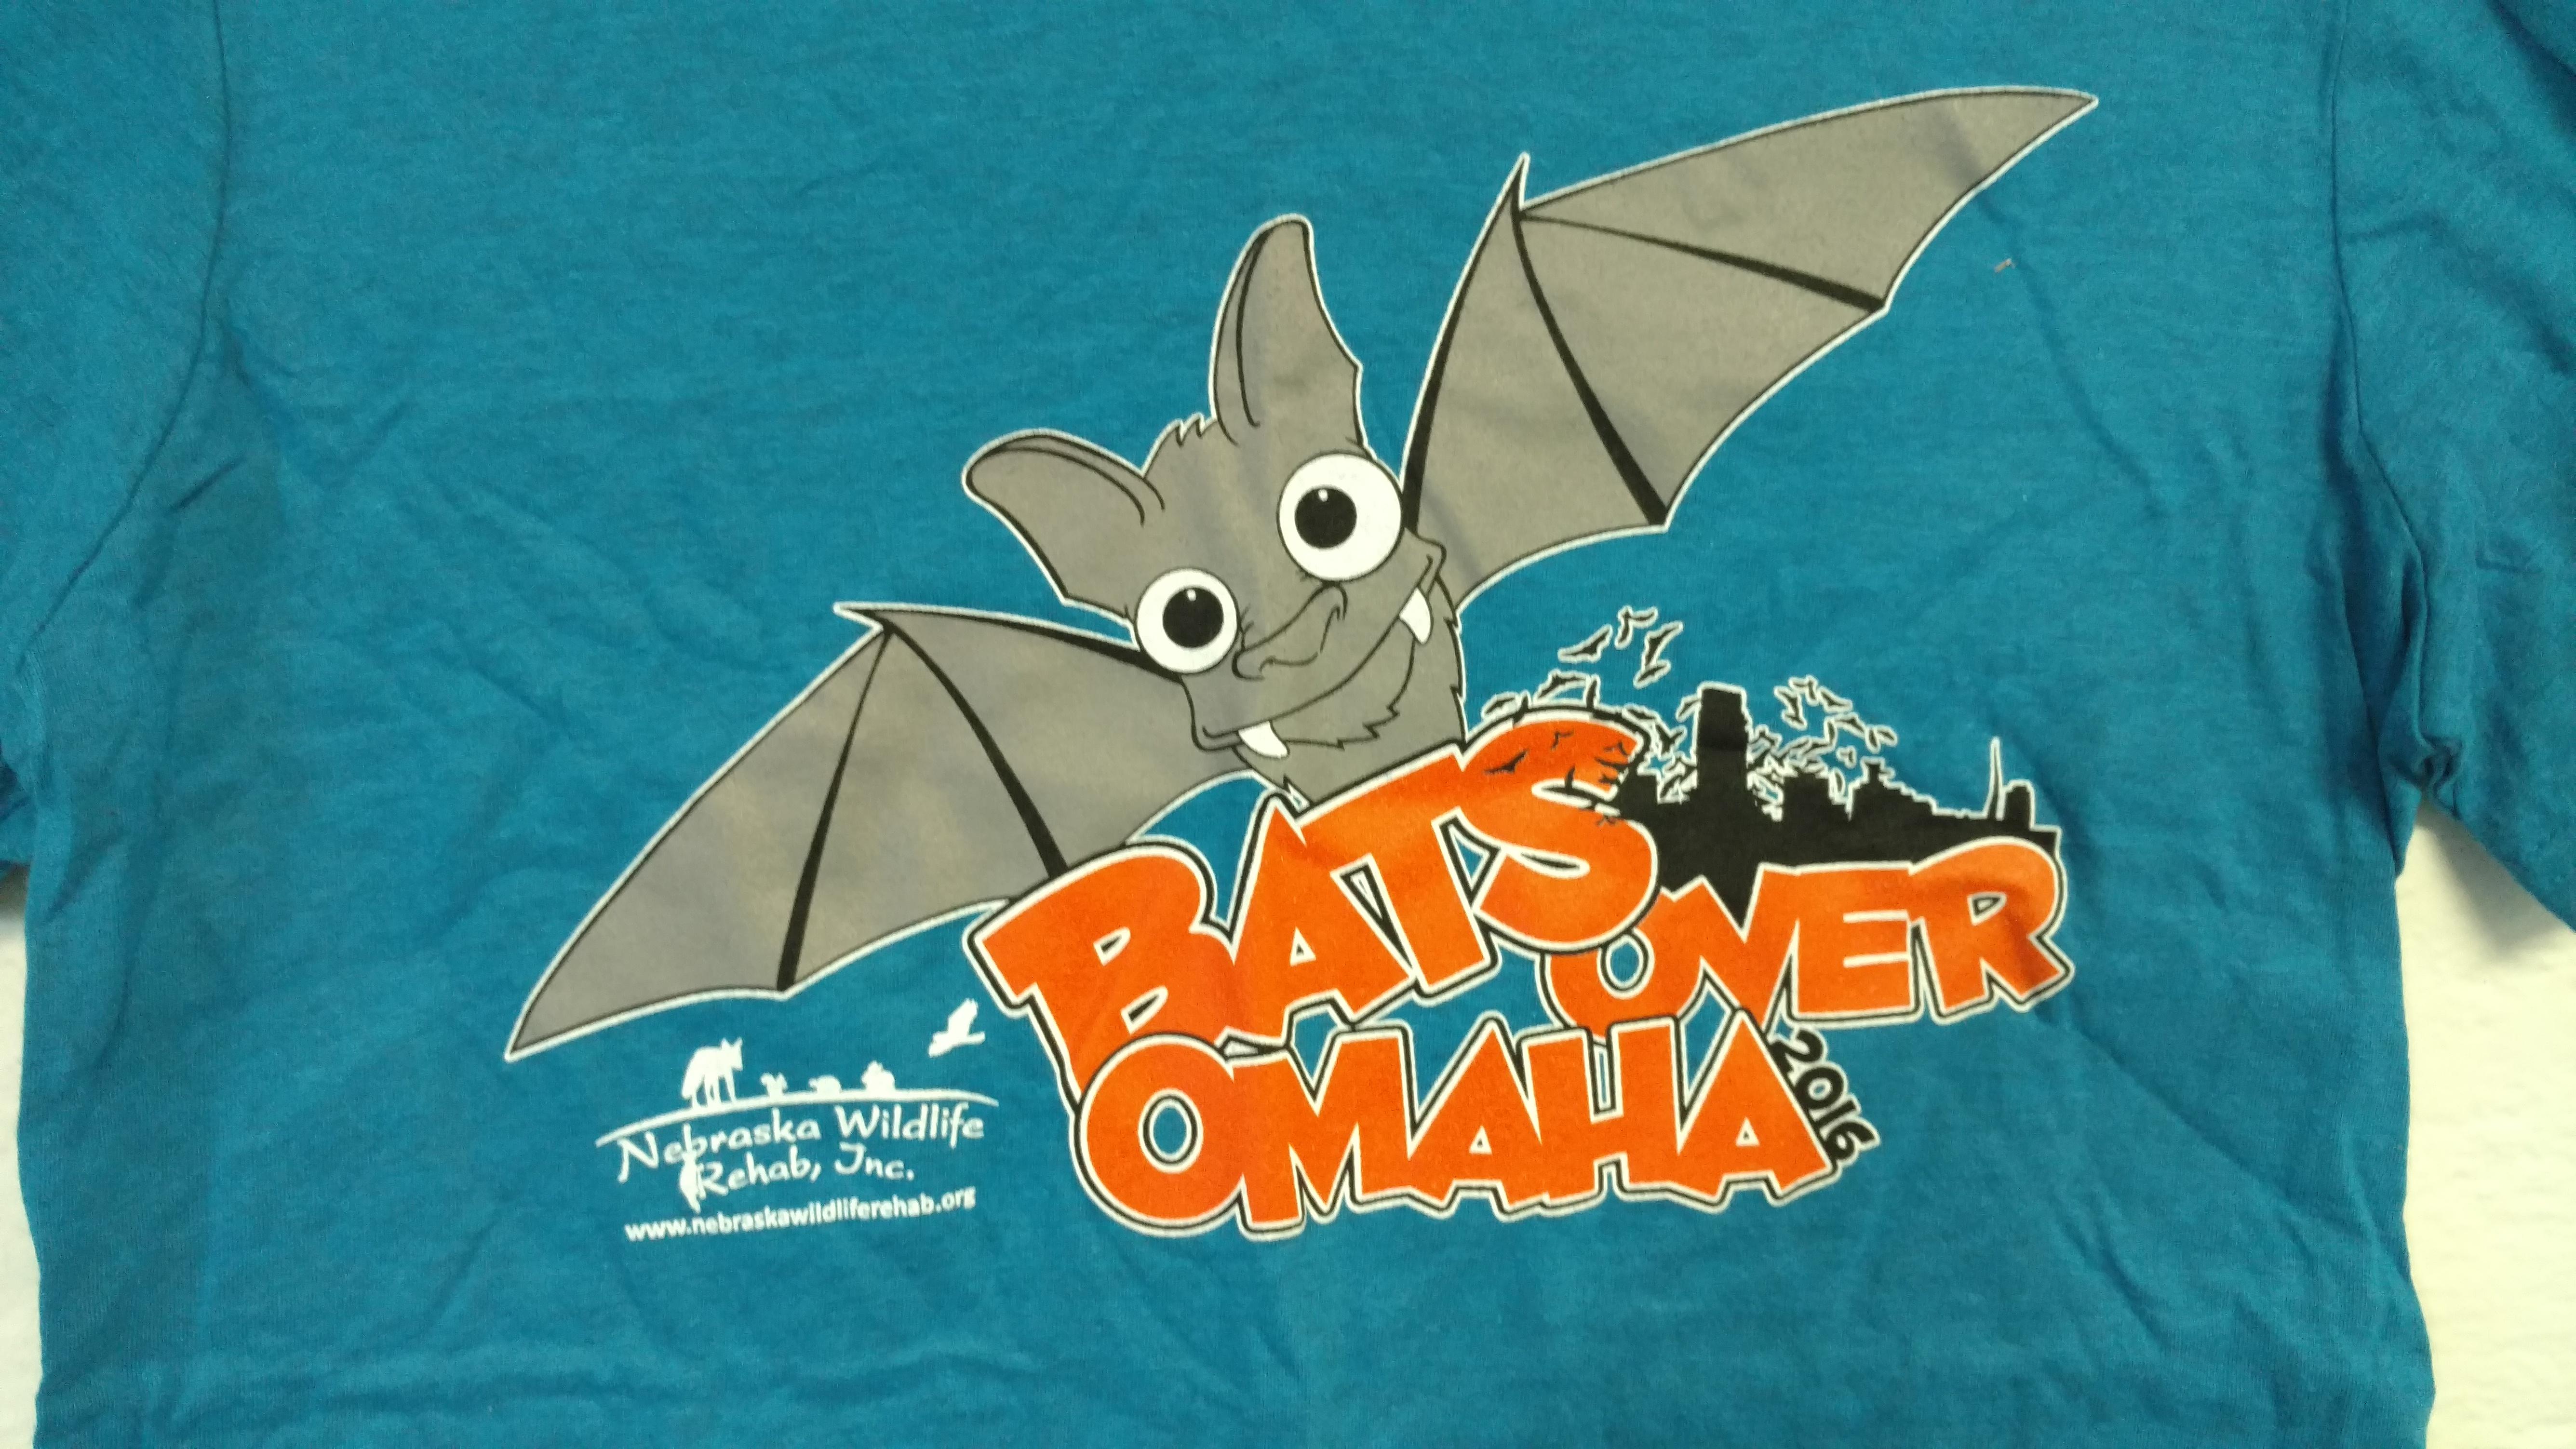 Bats Over Omaha Bat Release T-Shirt - 2016: Adult XL, Teal